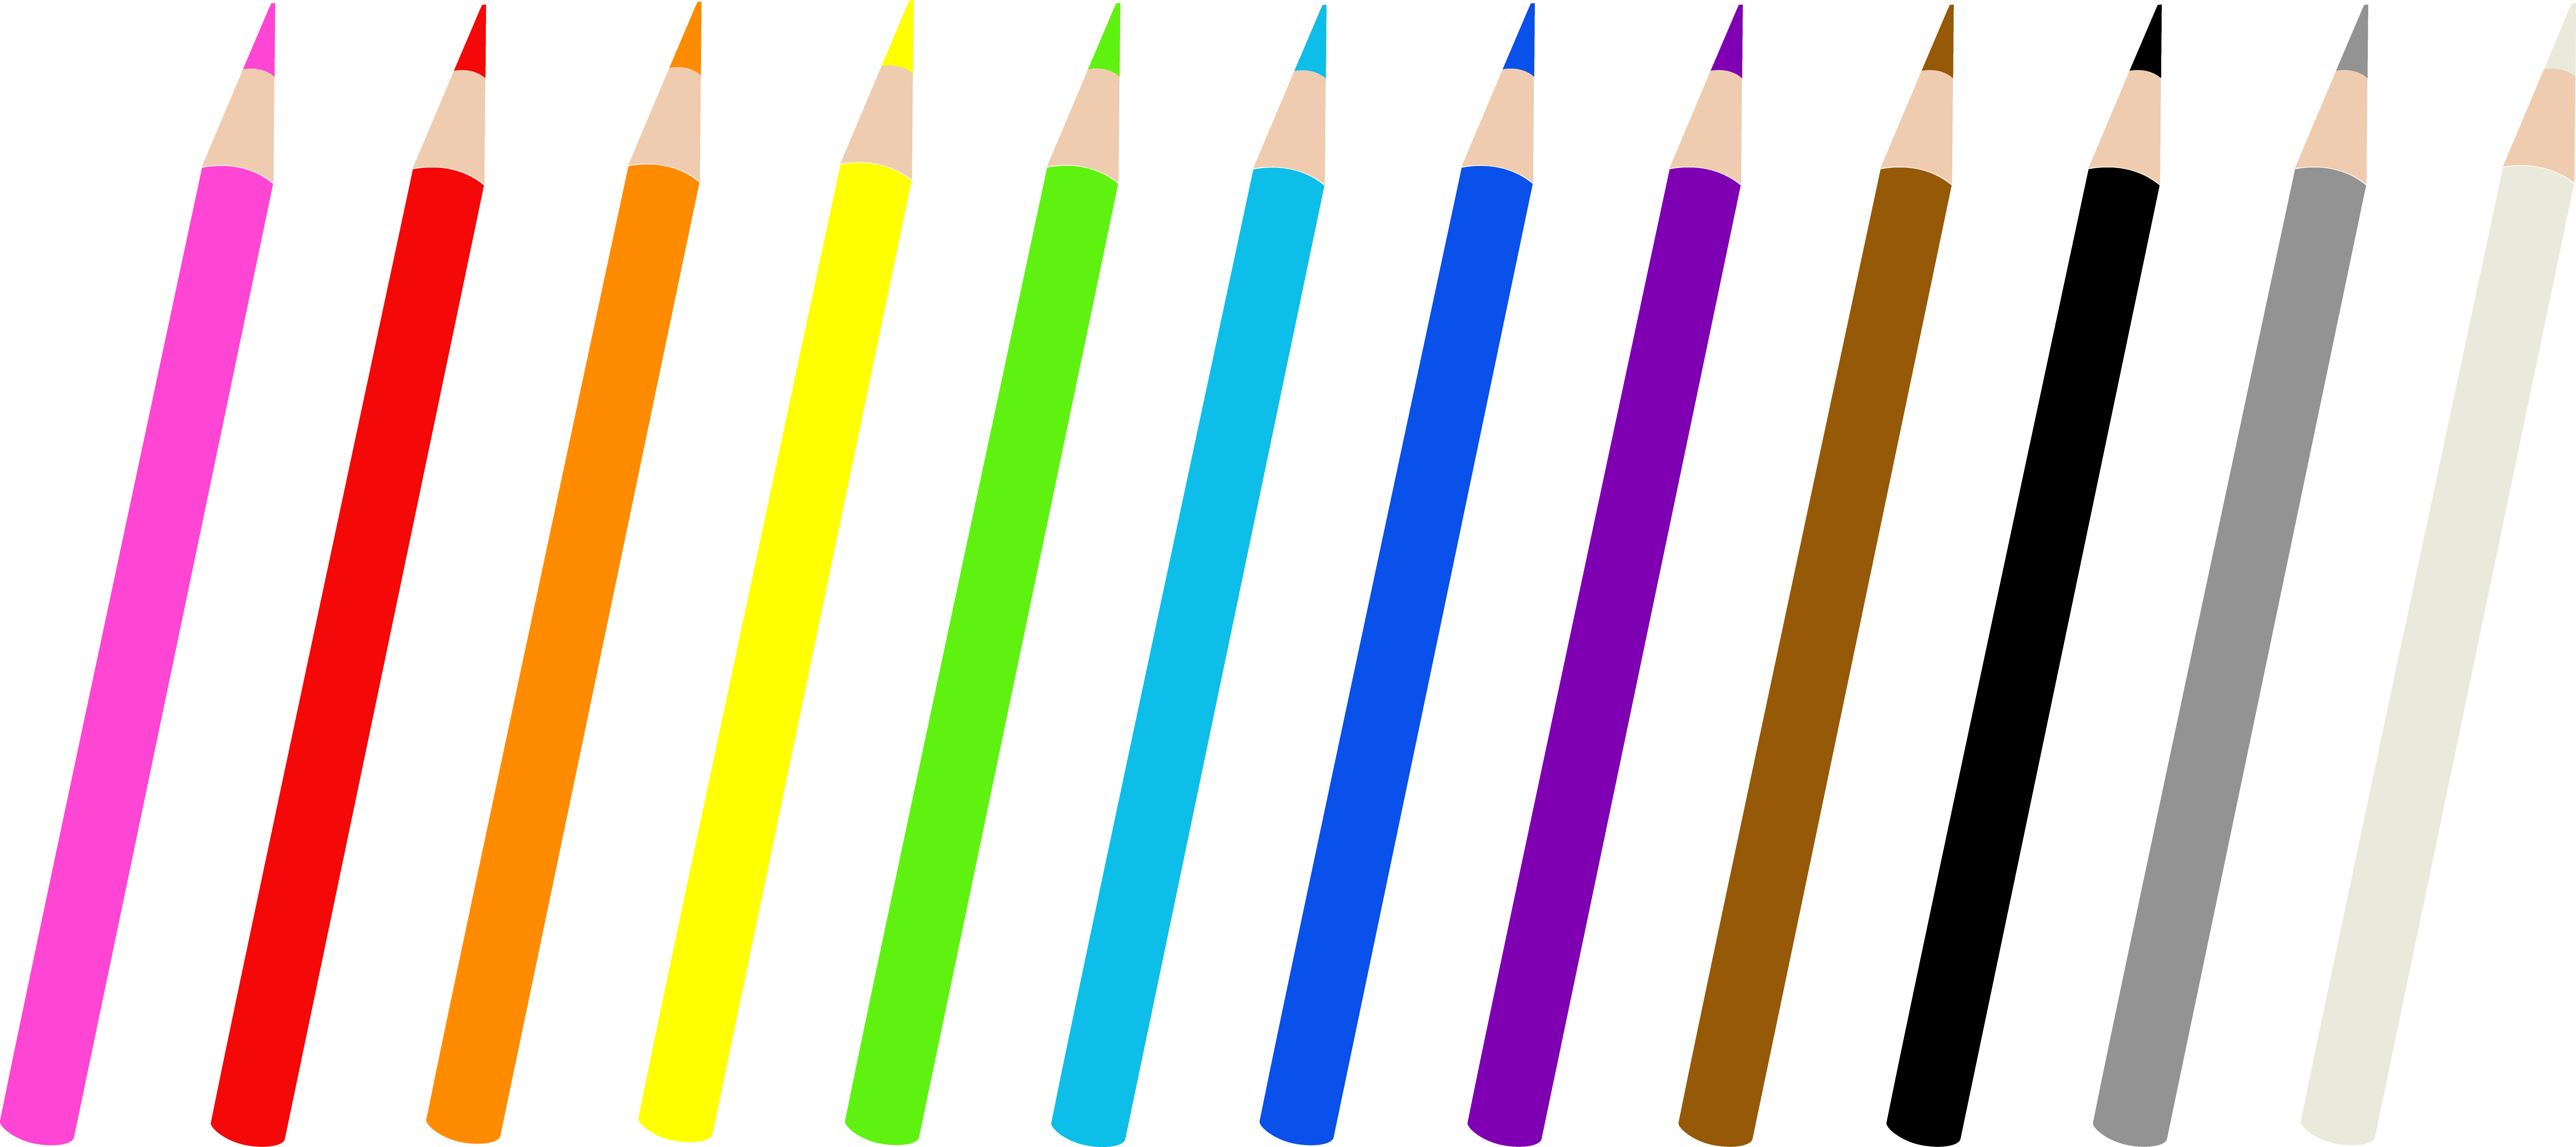 Free colored pencils.